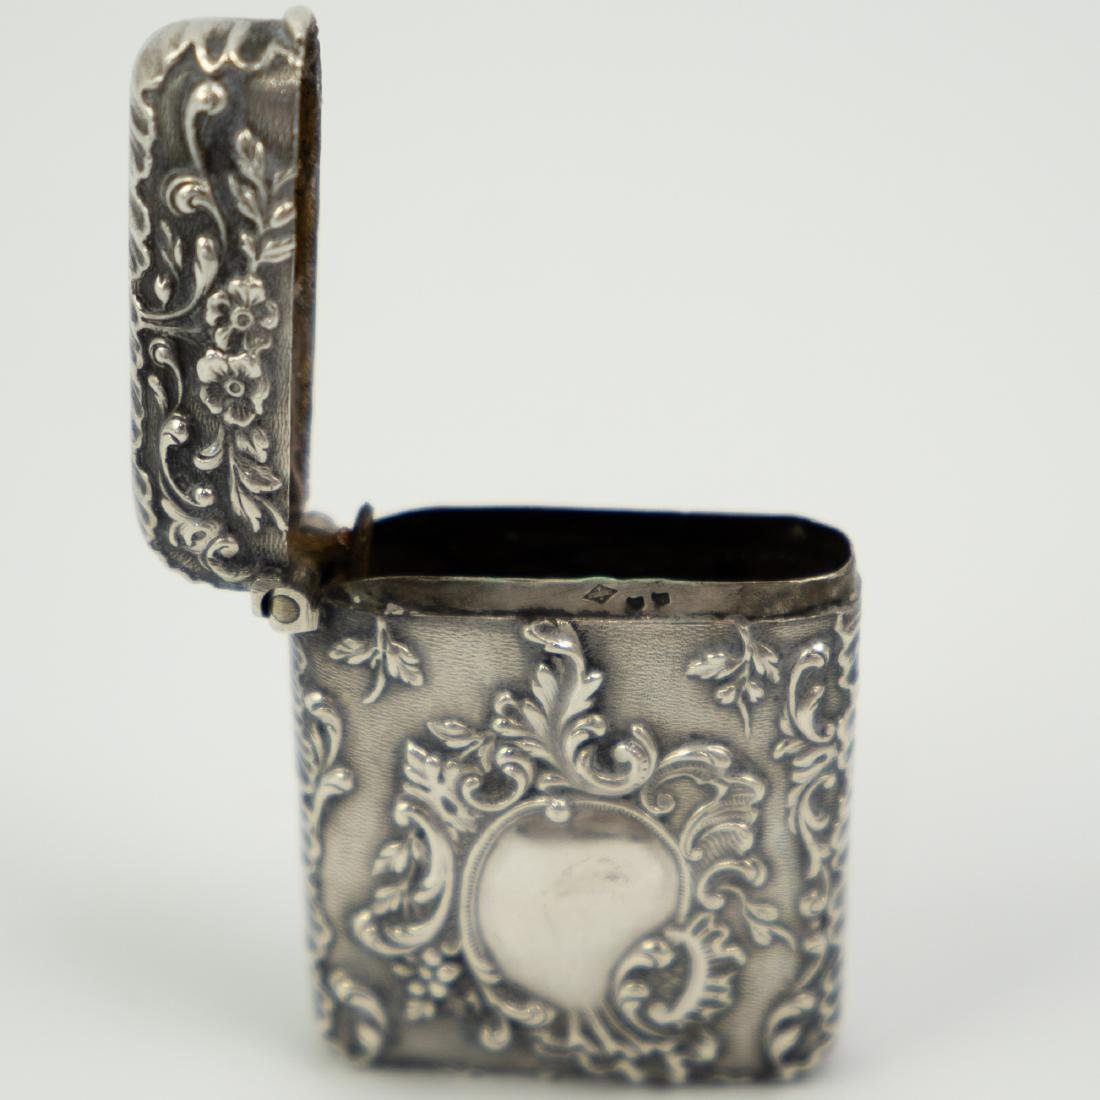 French Silver Match / Vesta Case - 4